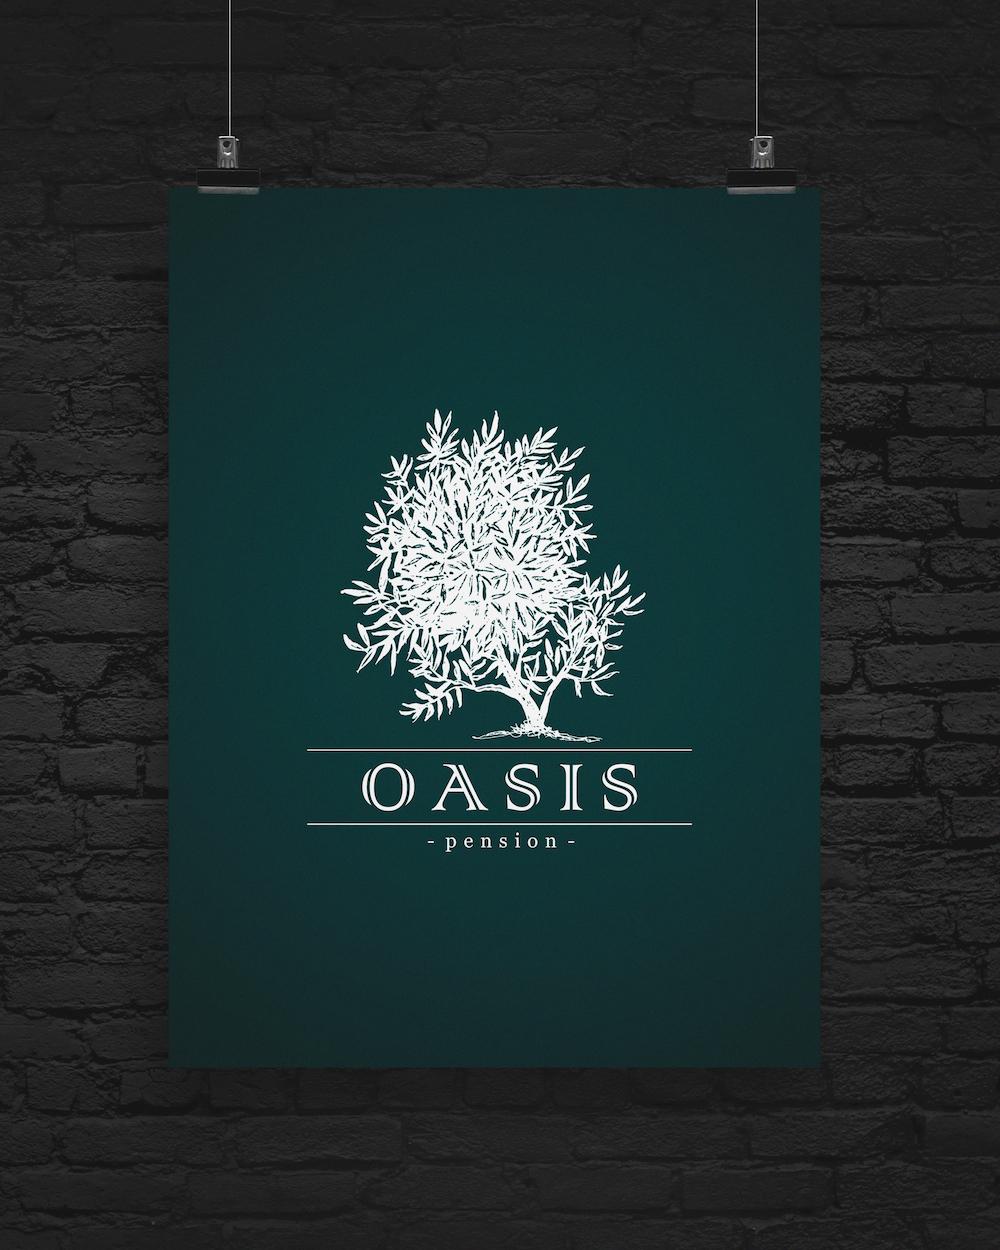 Oasis-logo-2